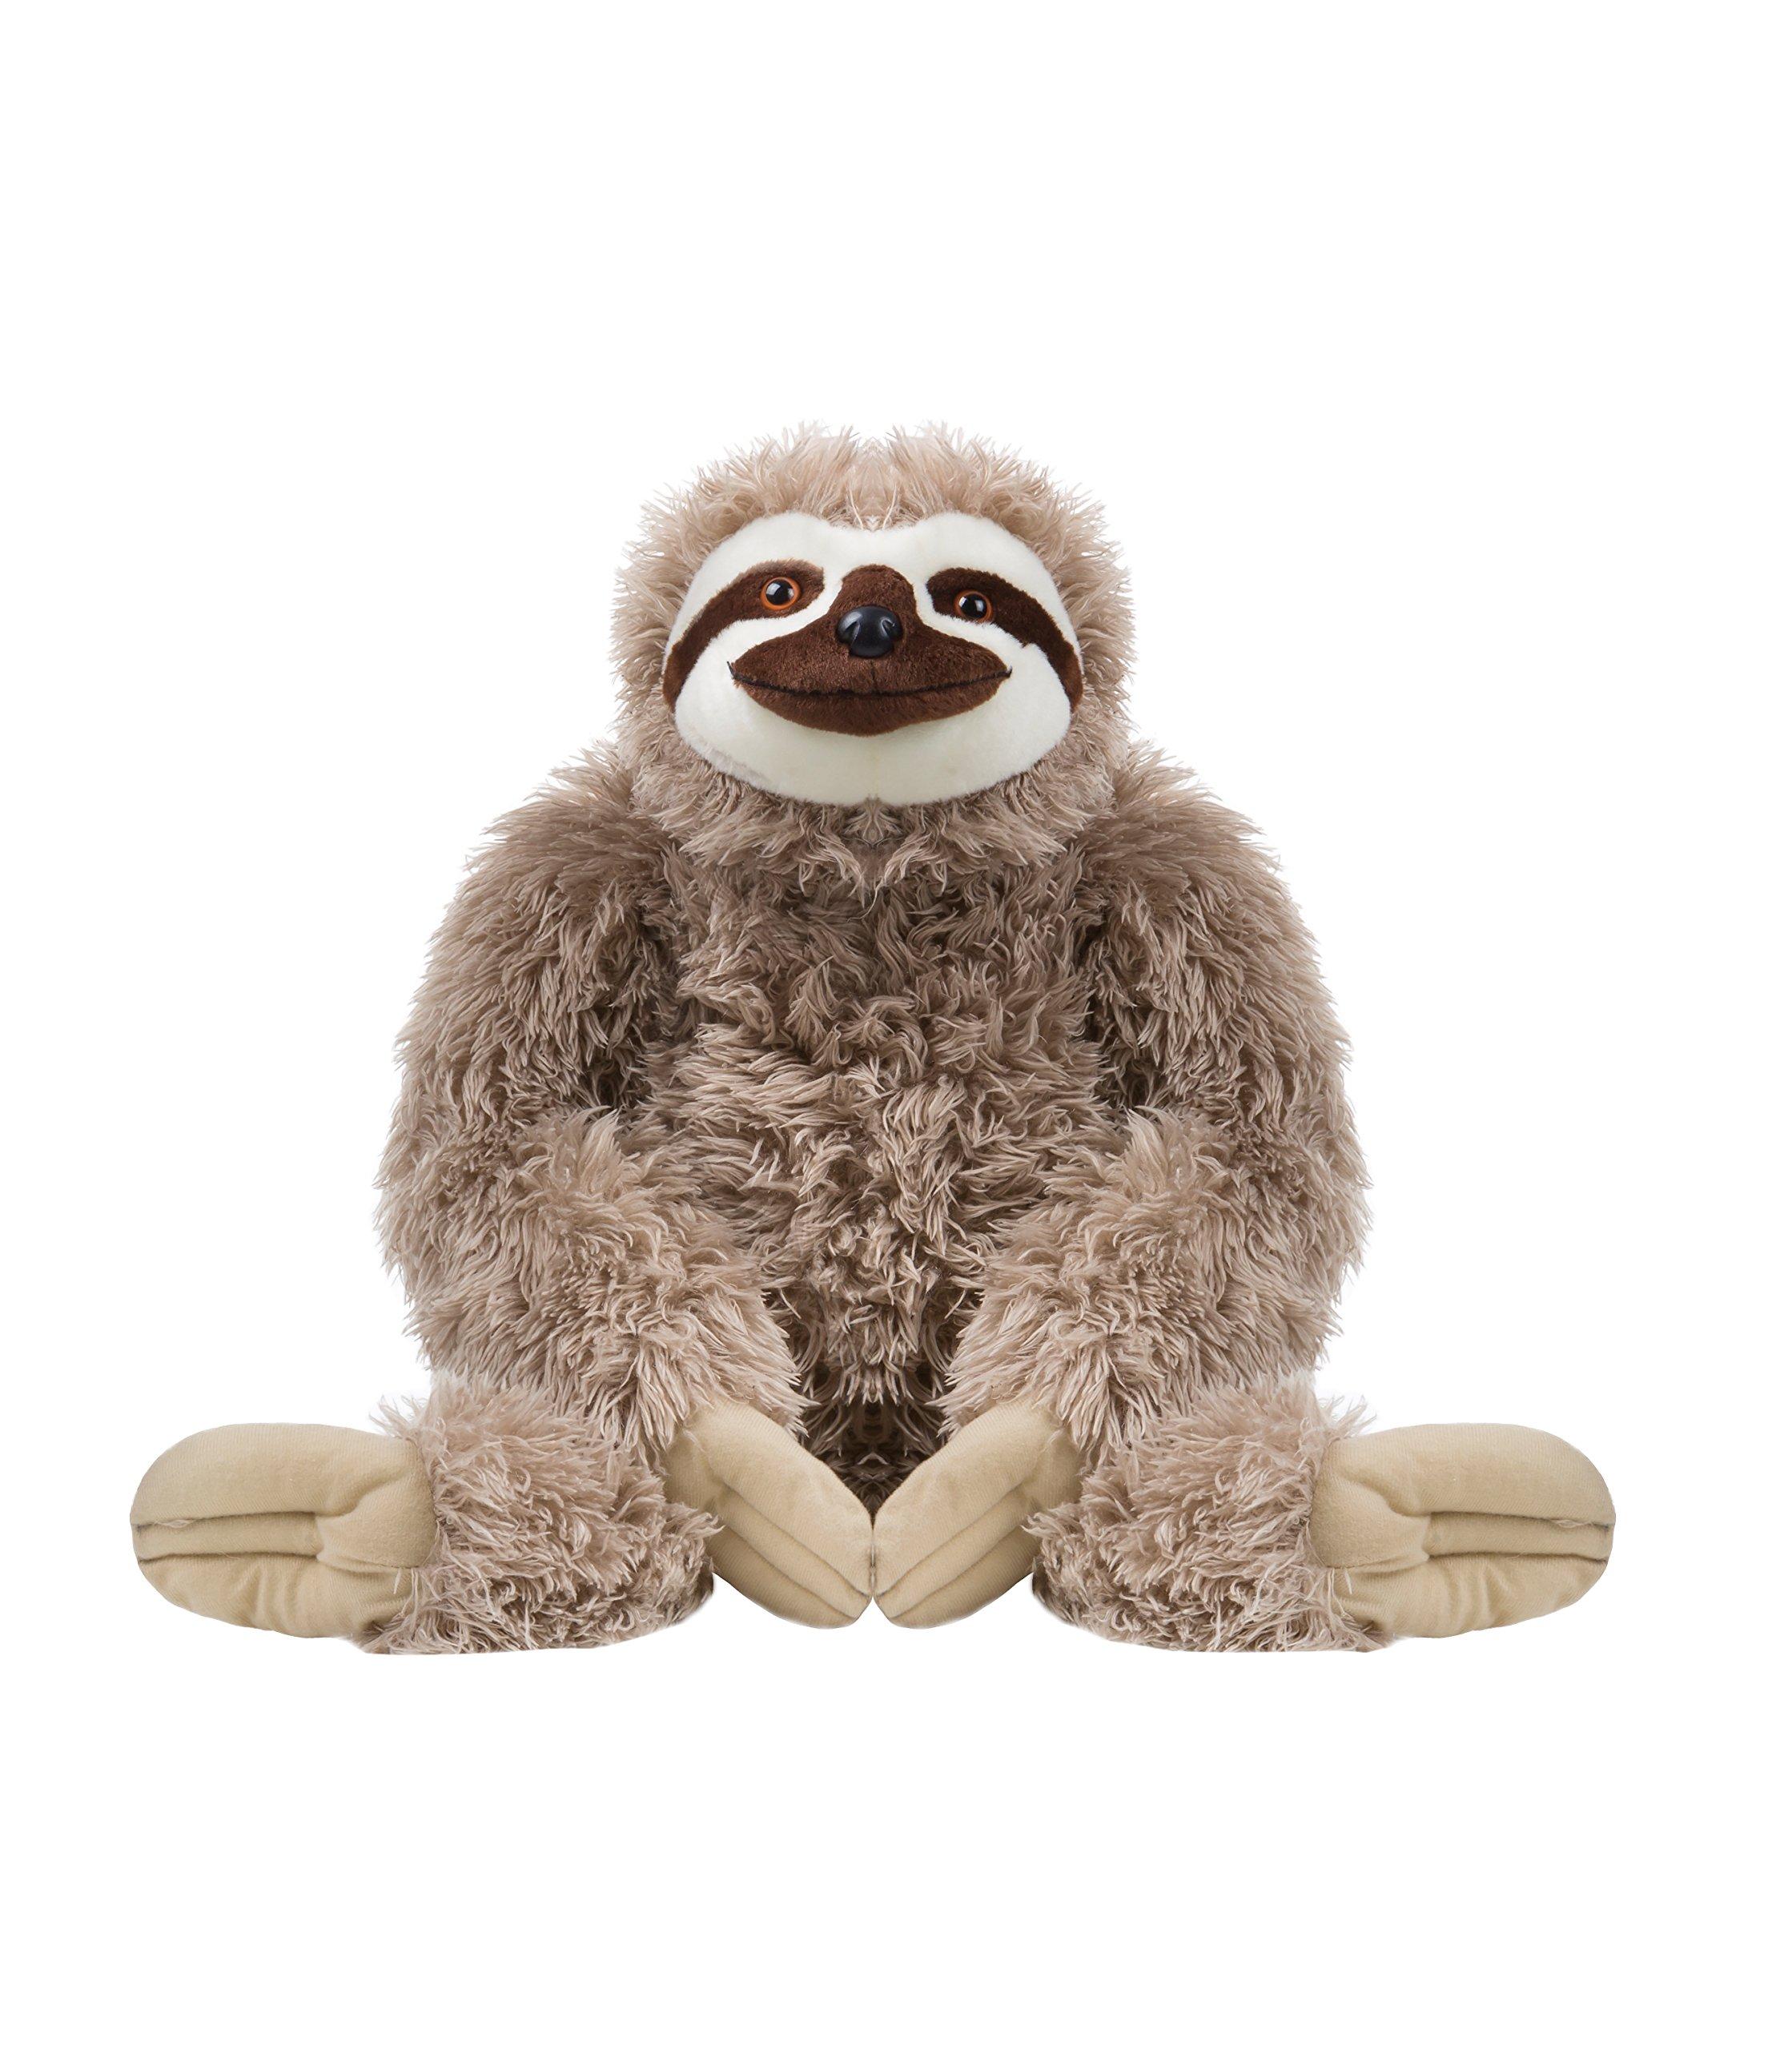 Wild Republic Jumbo Sloth Plush, Giant Stuffed Animal, 30 Inches